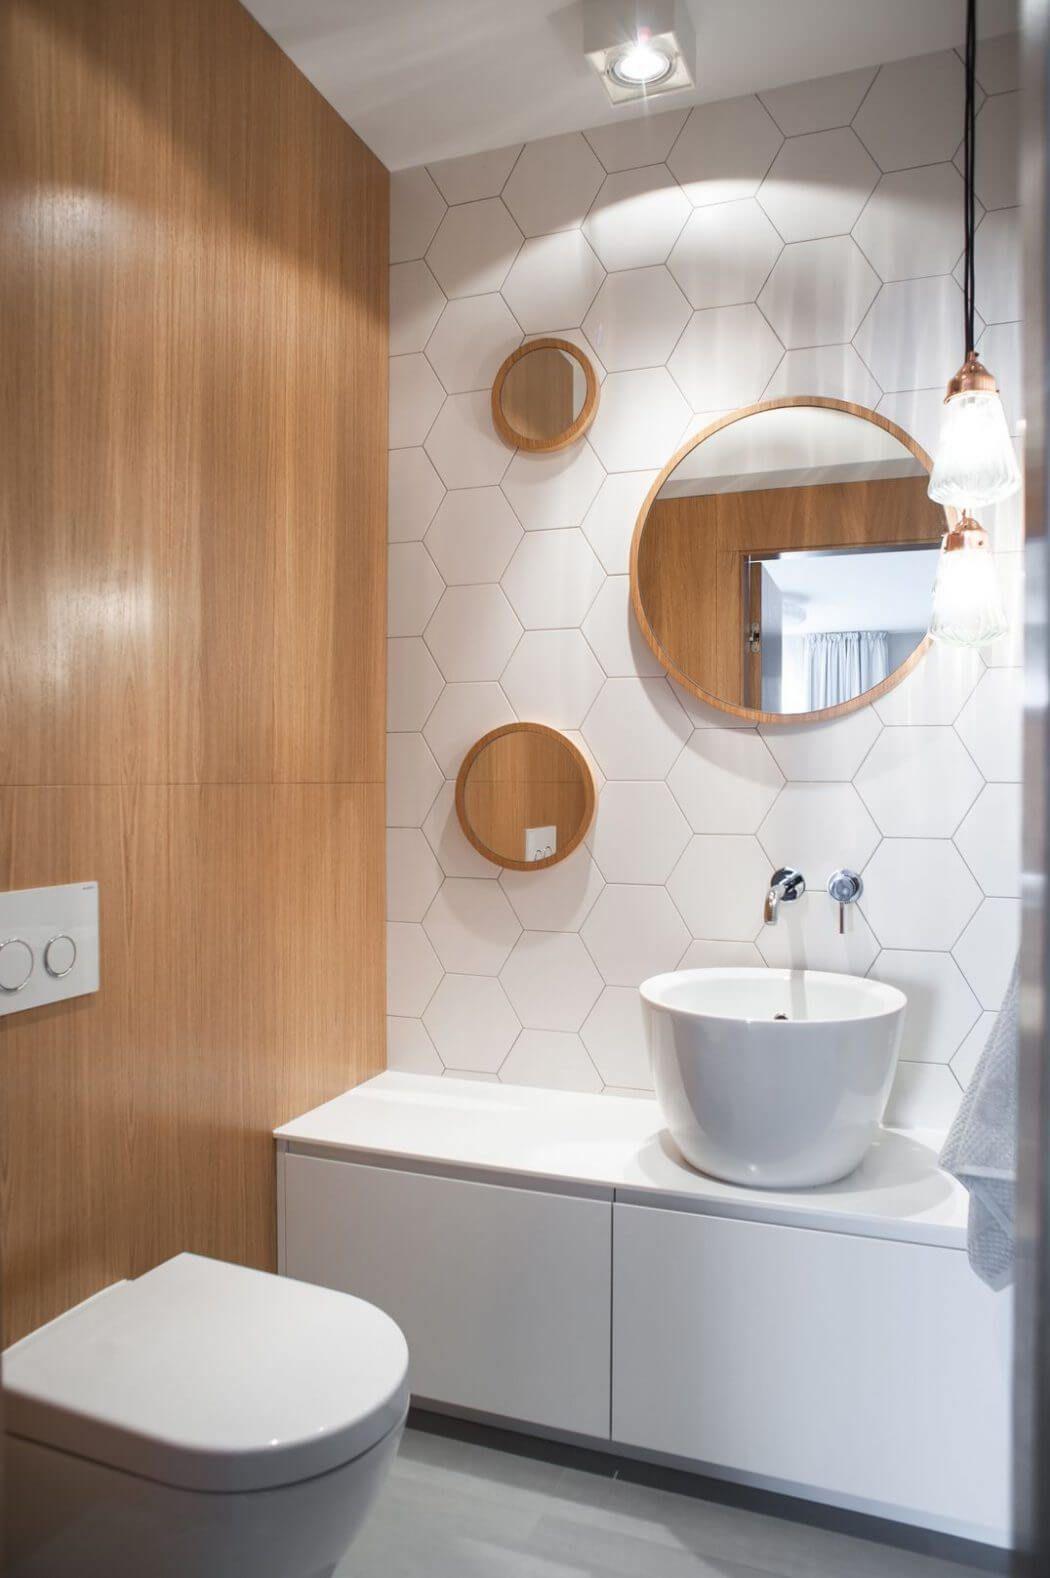 Focha Apartment by Raca Architekci | Modern contemporary bathrooms on bathroom design with sauna, bathroom design with fireplace, bathroom design with whirlpool, bathroom design with double vanity, bathroom design with beach, bathroom design with tv, bathroom design with two sinks, bathroom design waterfall, bathroom design with laundry, bathroom design shower, bathroom design restaurant, bathroom design spa, bathroom design with garage, bathroom design with separate toilet,